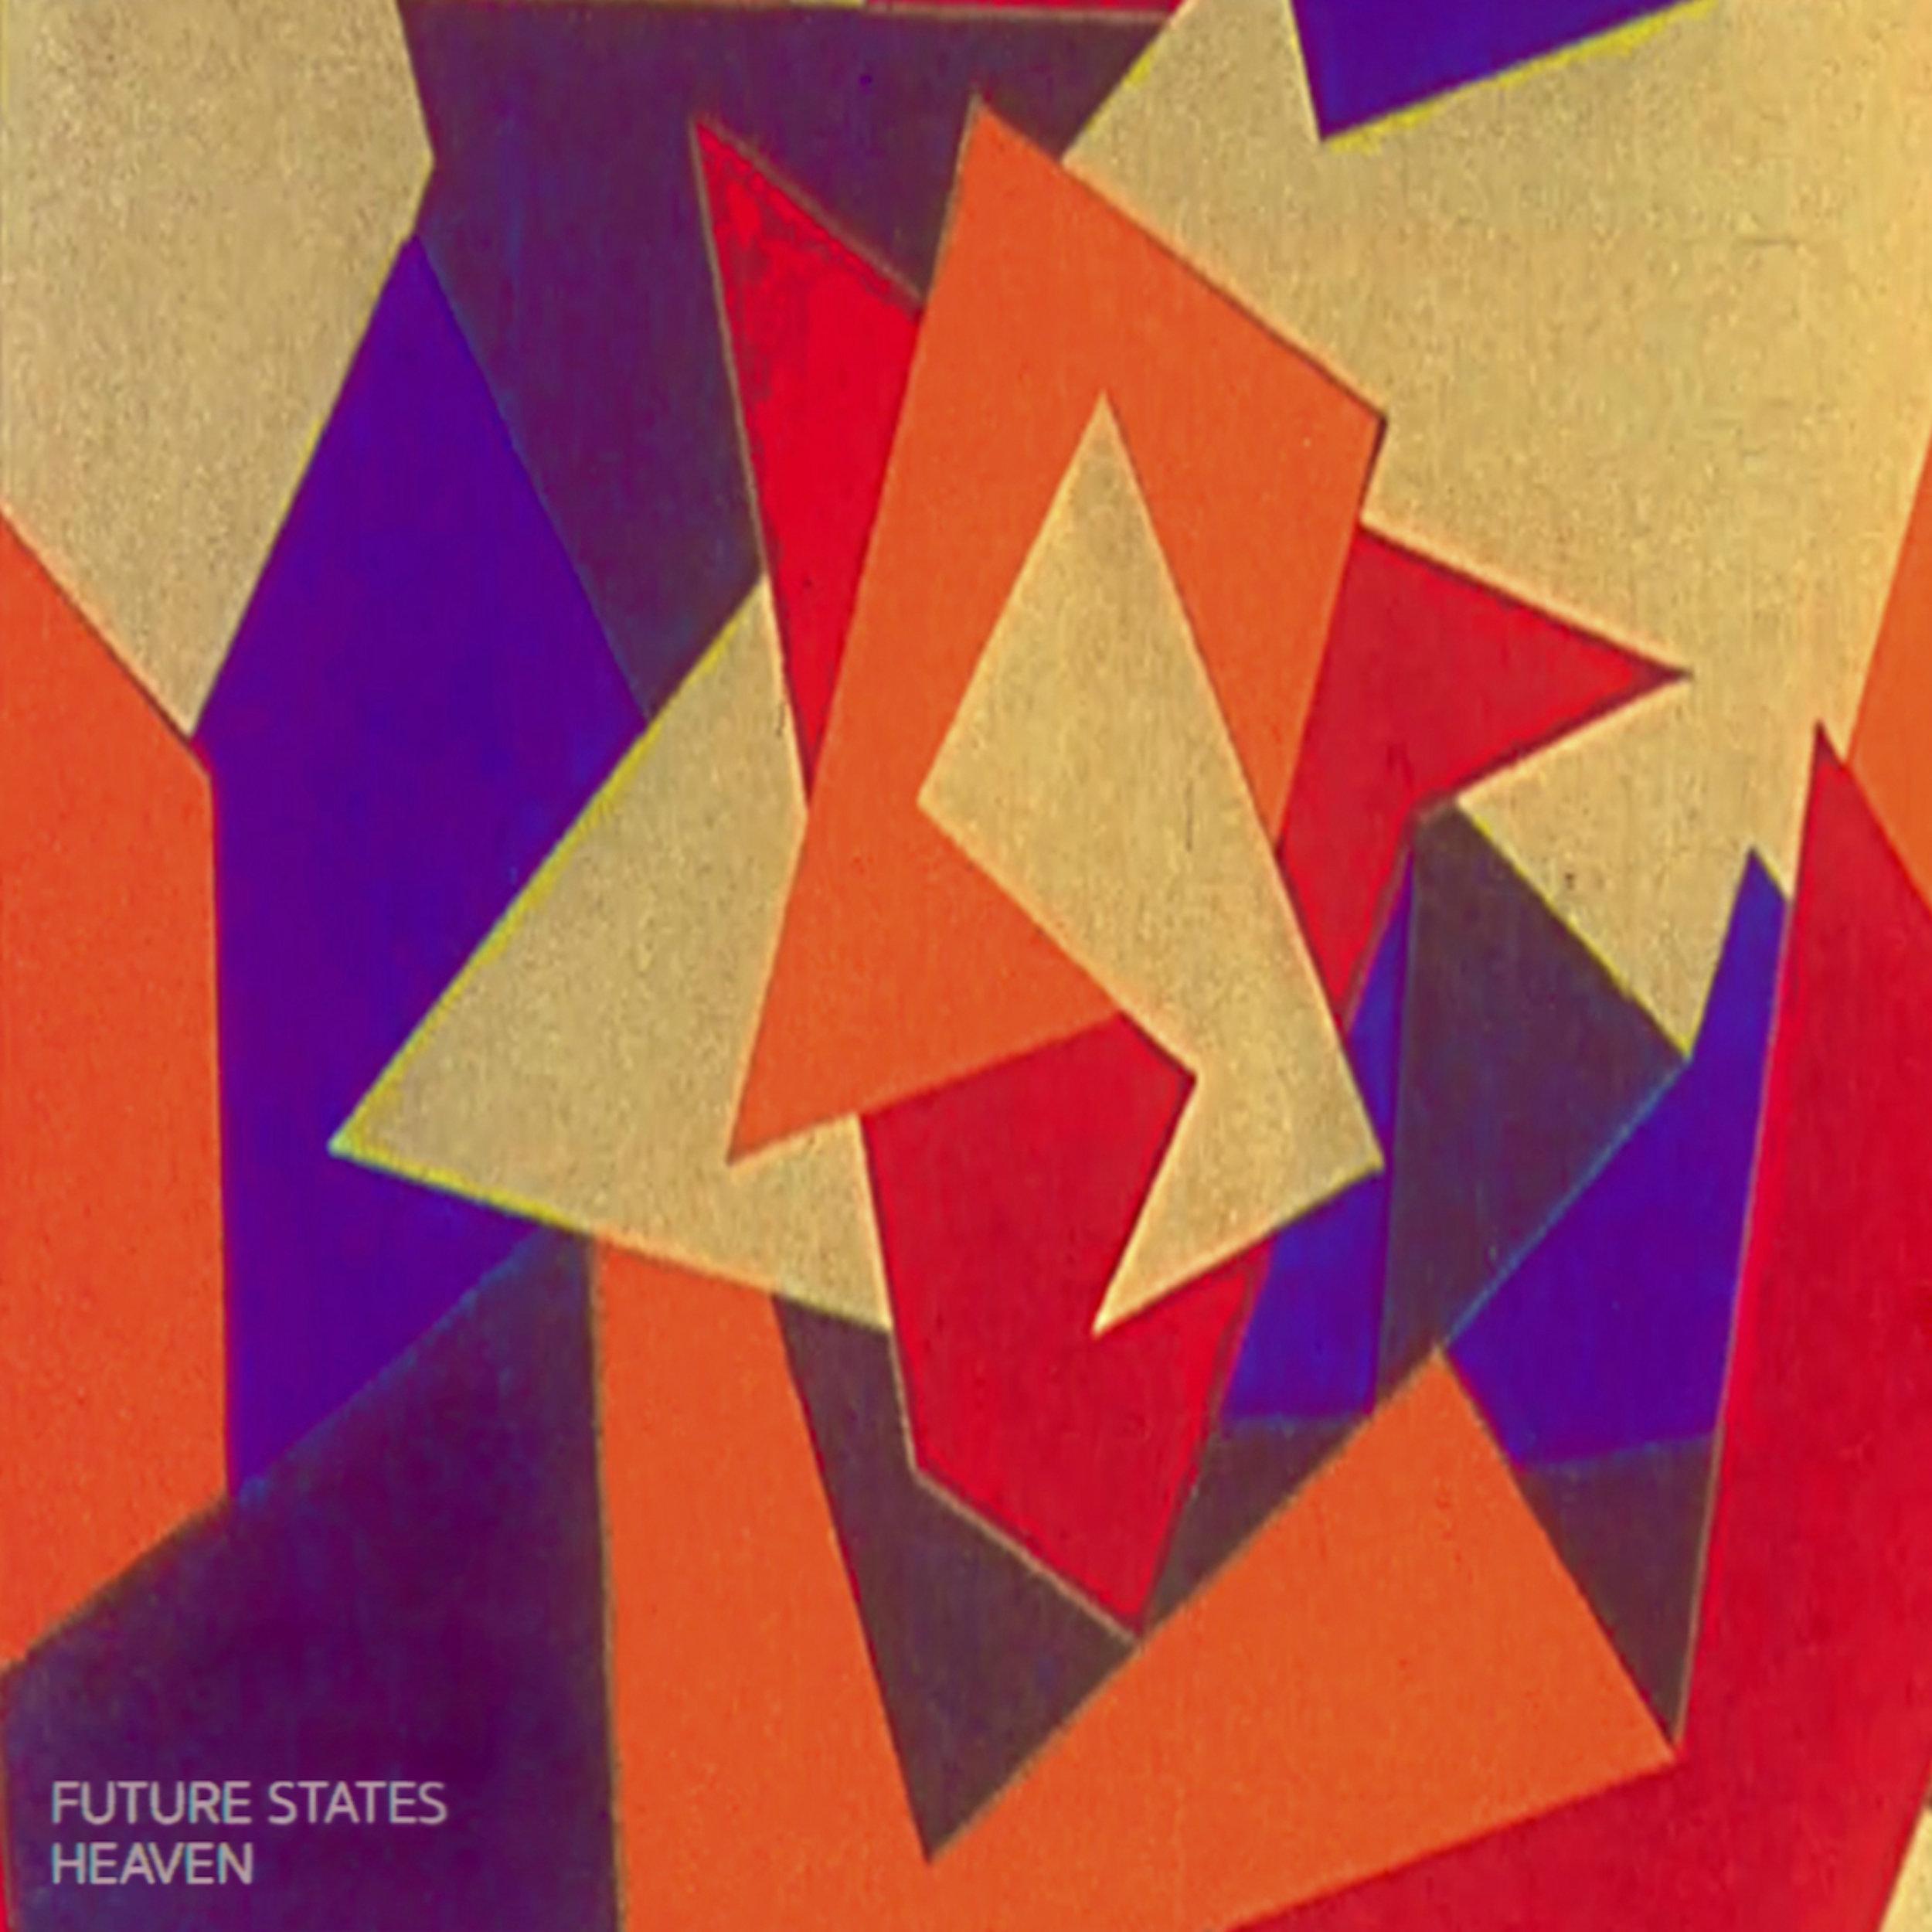 Future States - Heaven / Bugaboo